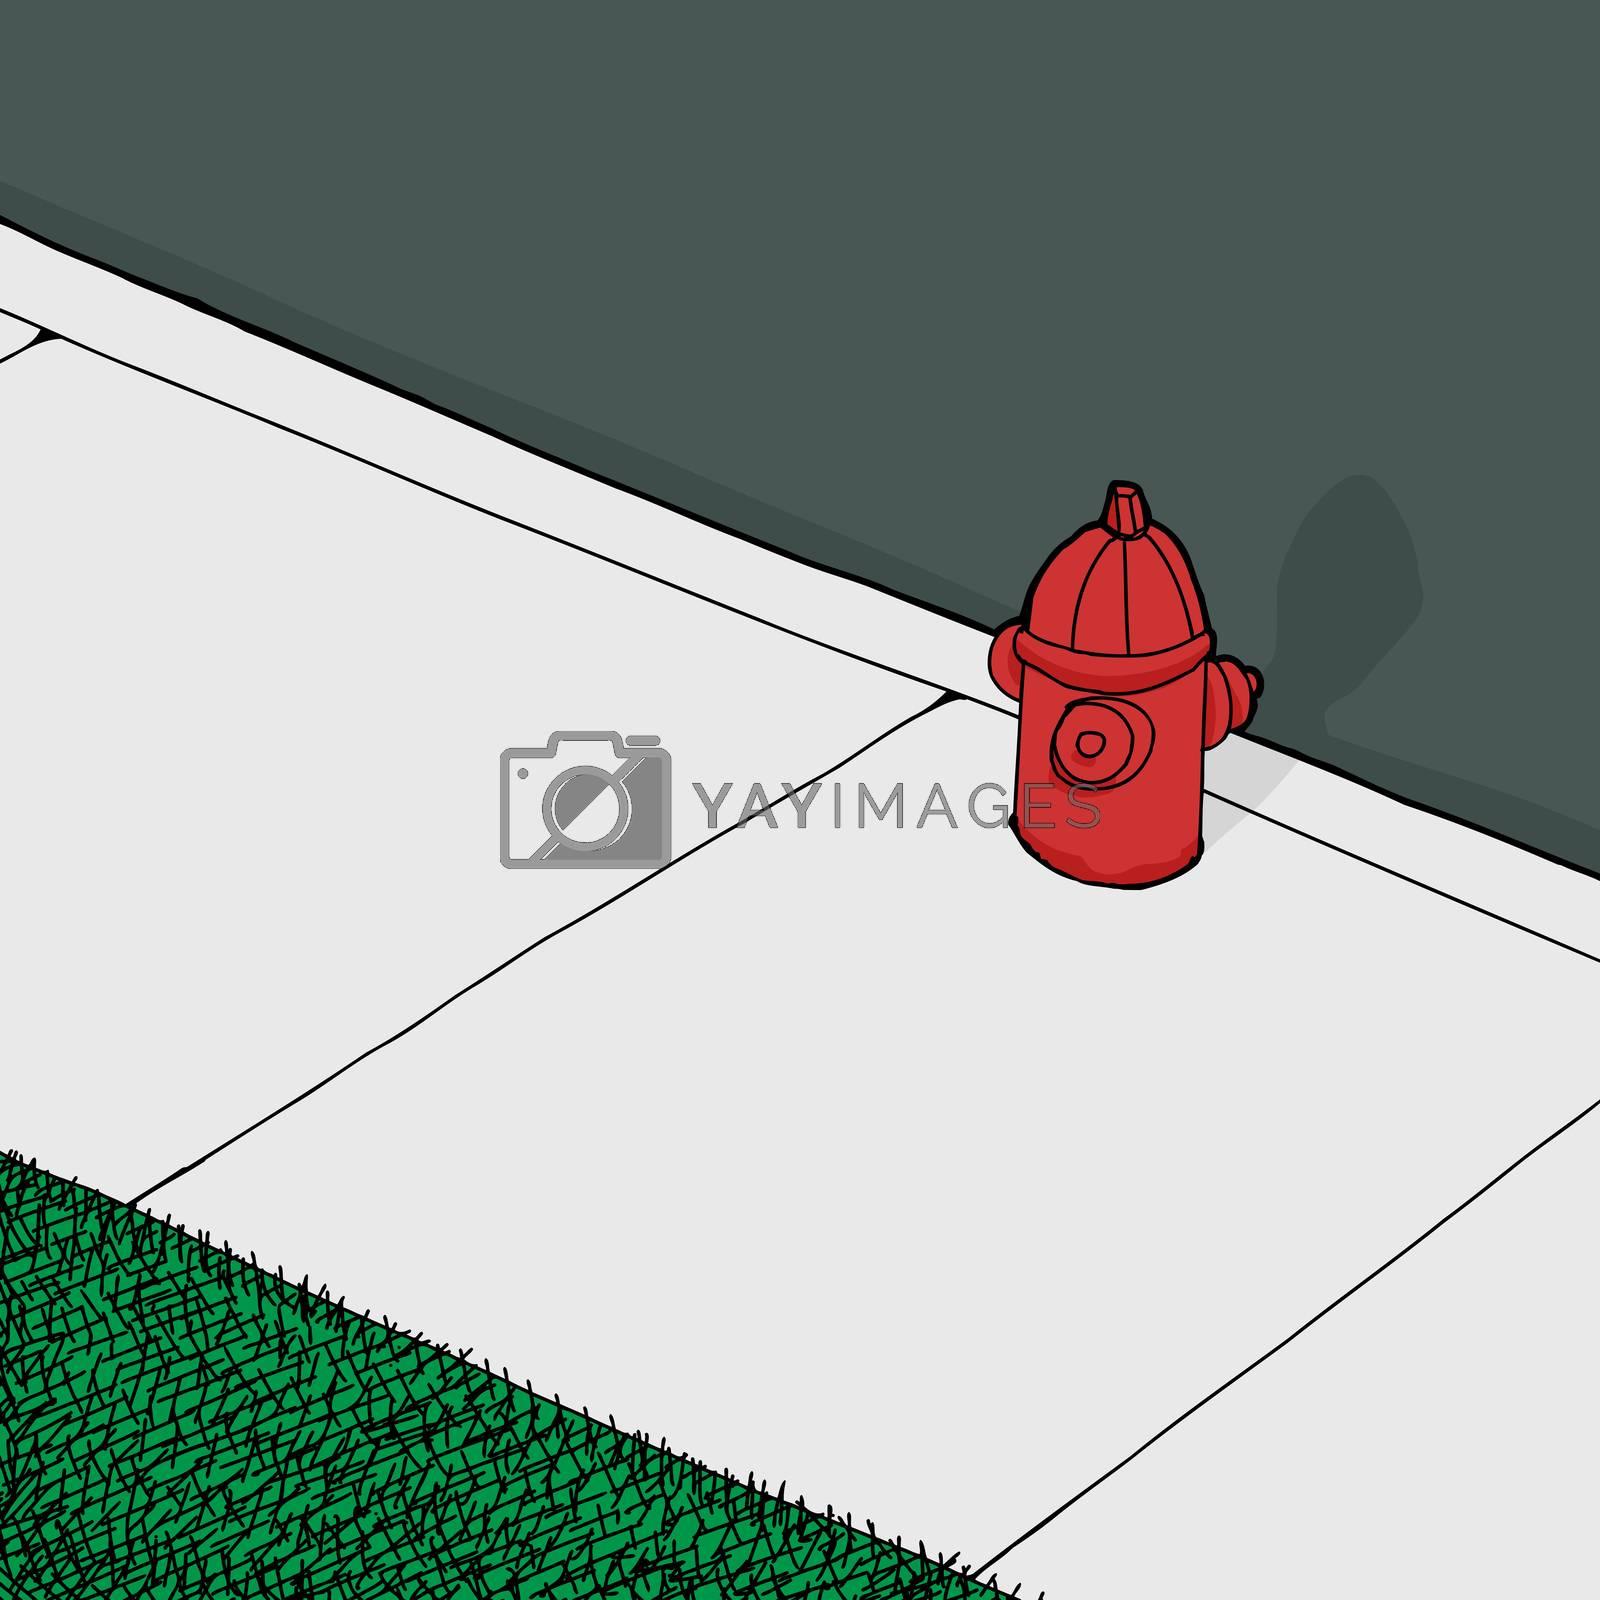 Royalty free image of Fire Plug on Sidewalk by TheBlackRhino